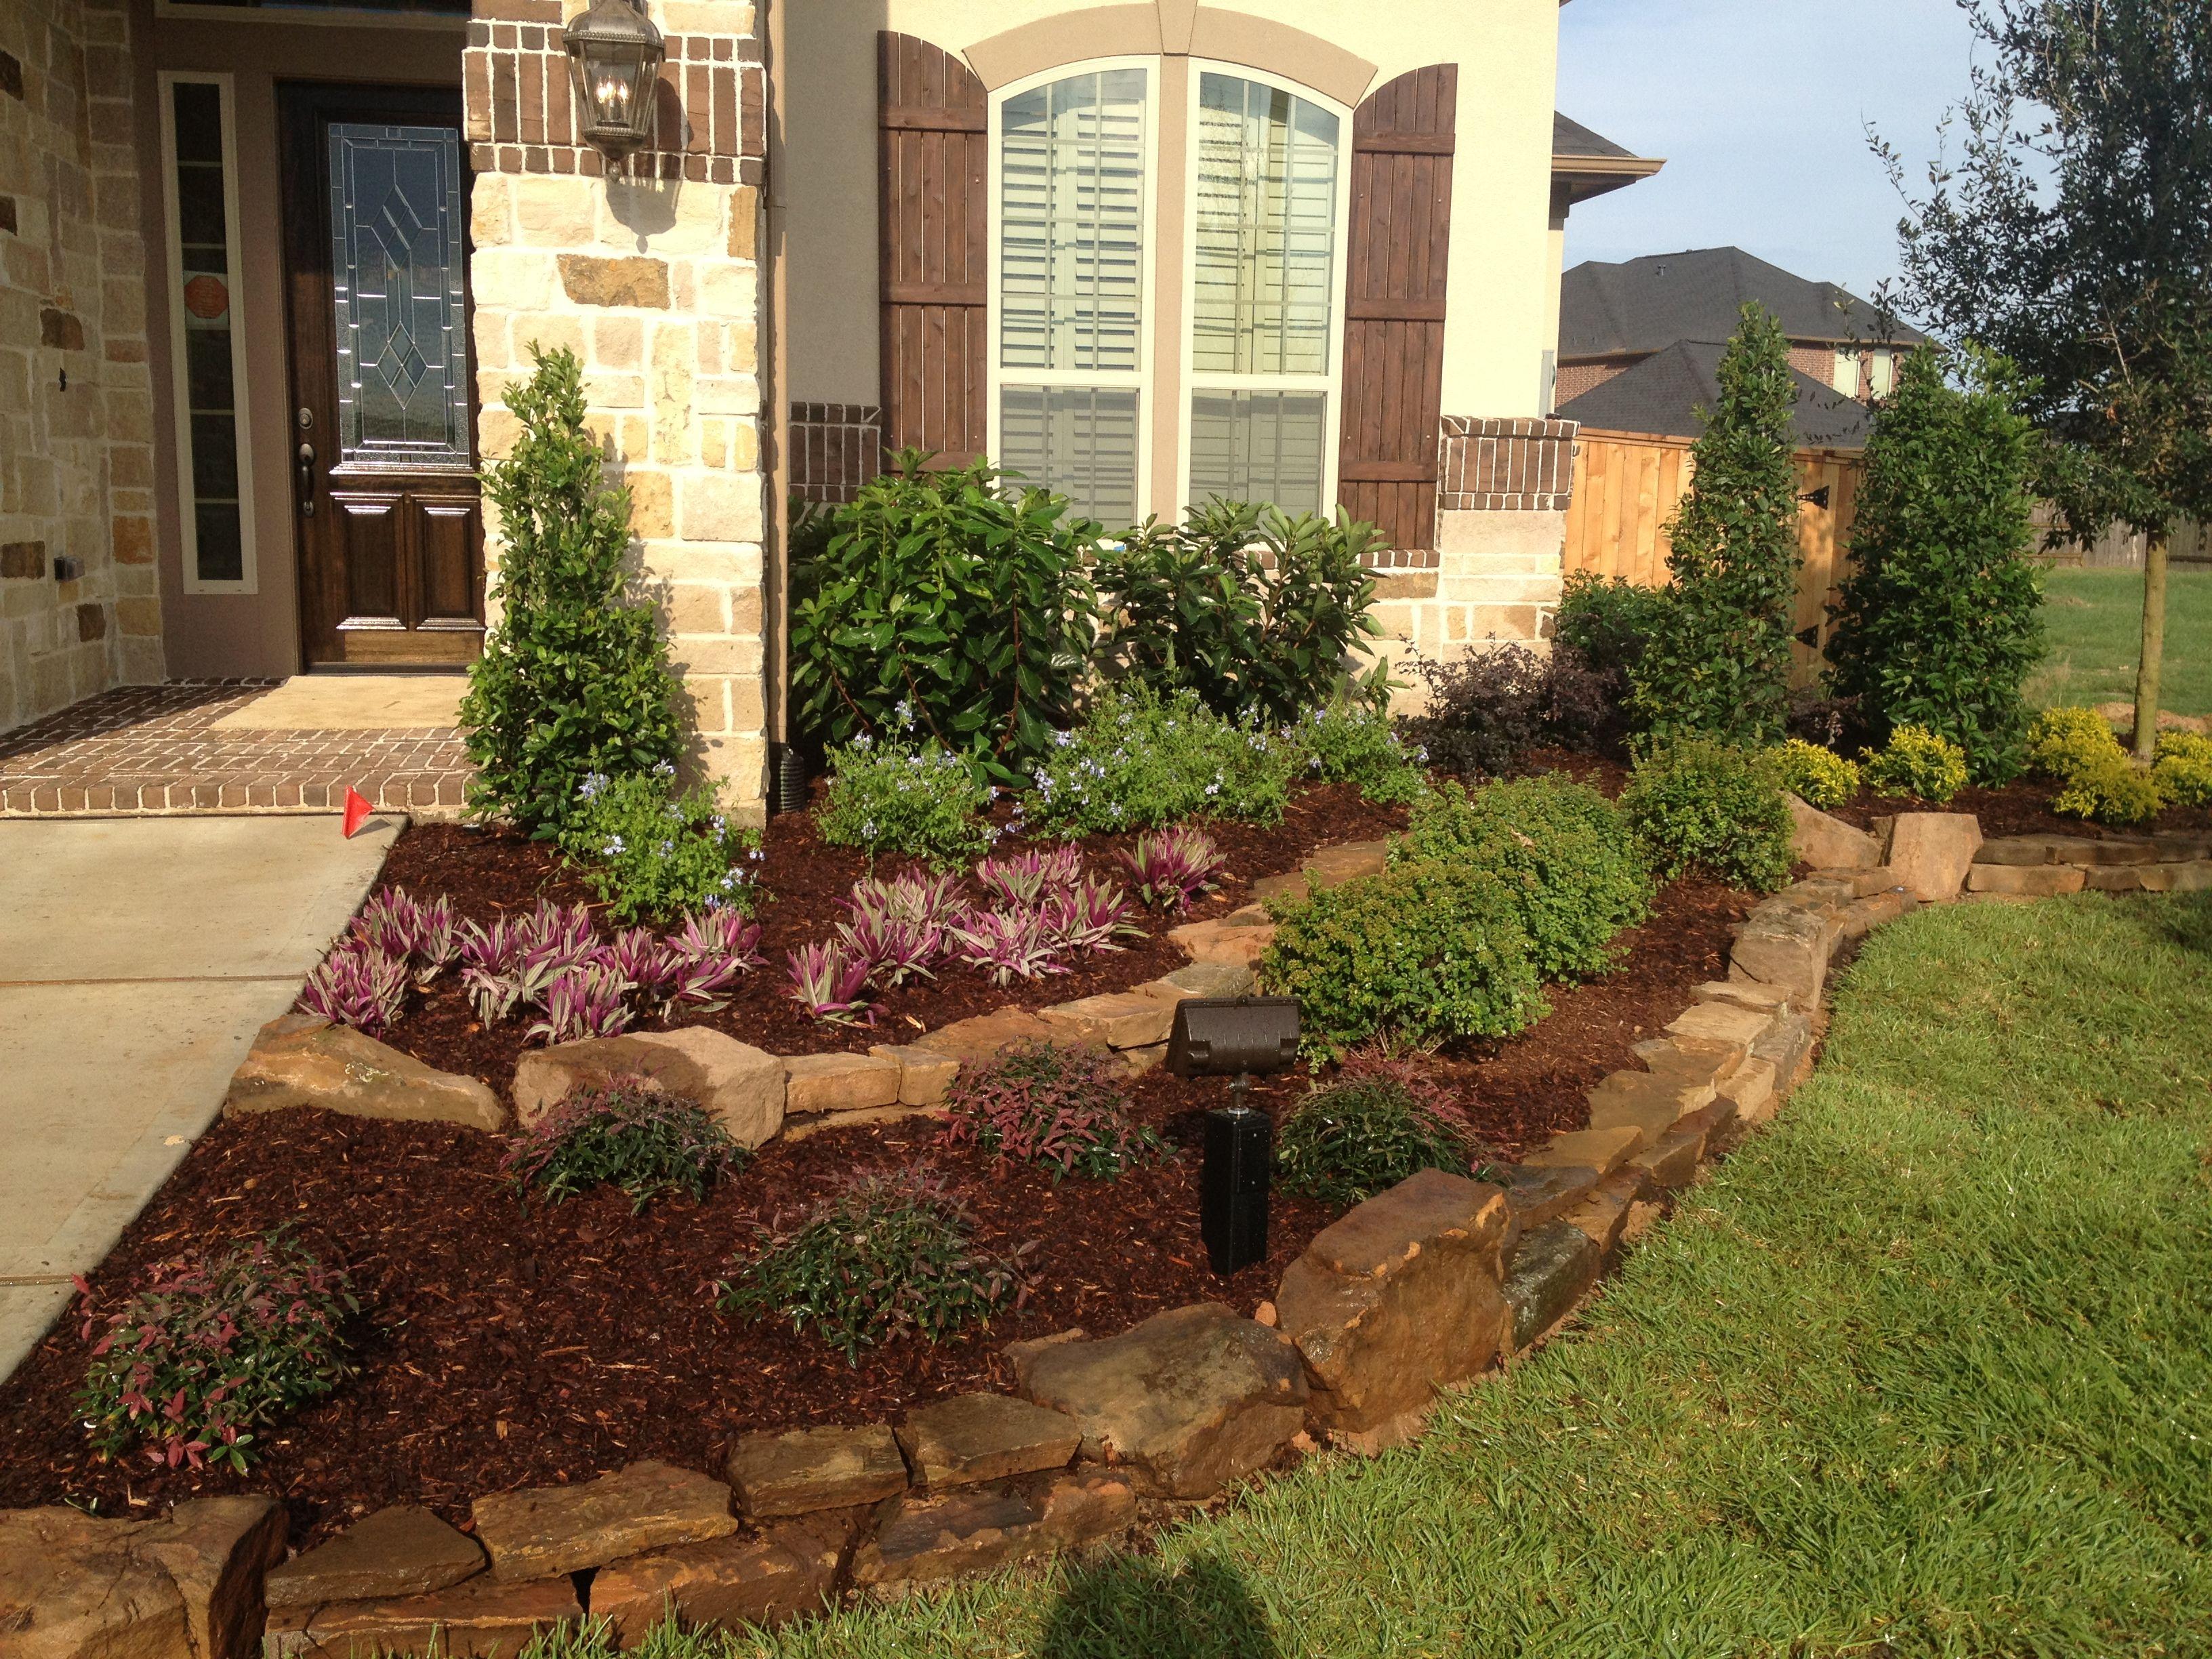 Front Entry To Model Home Home Landscaping Front Yard Landscaping Landscape Design